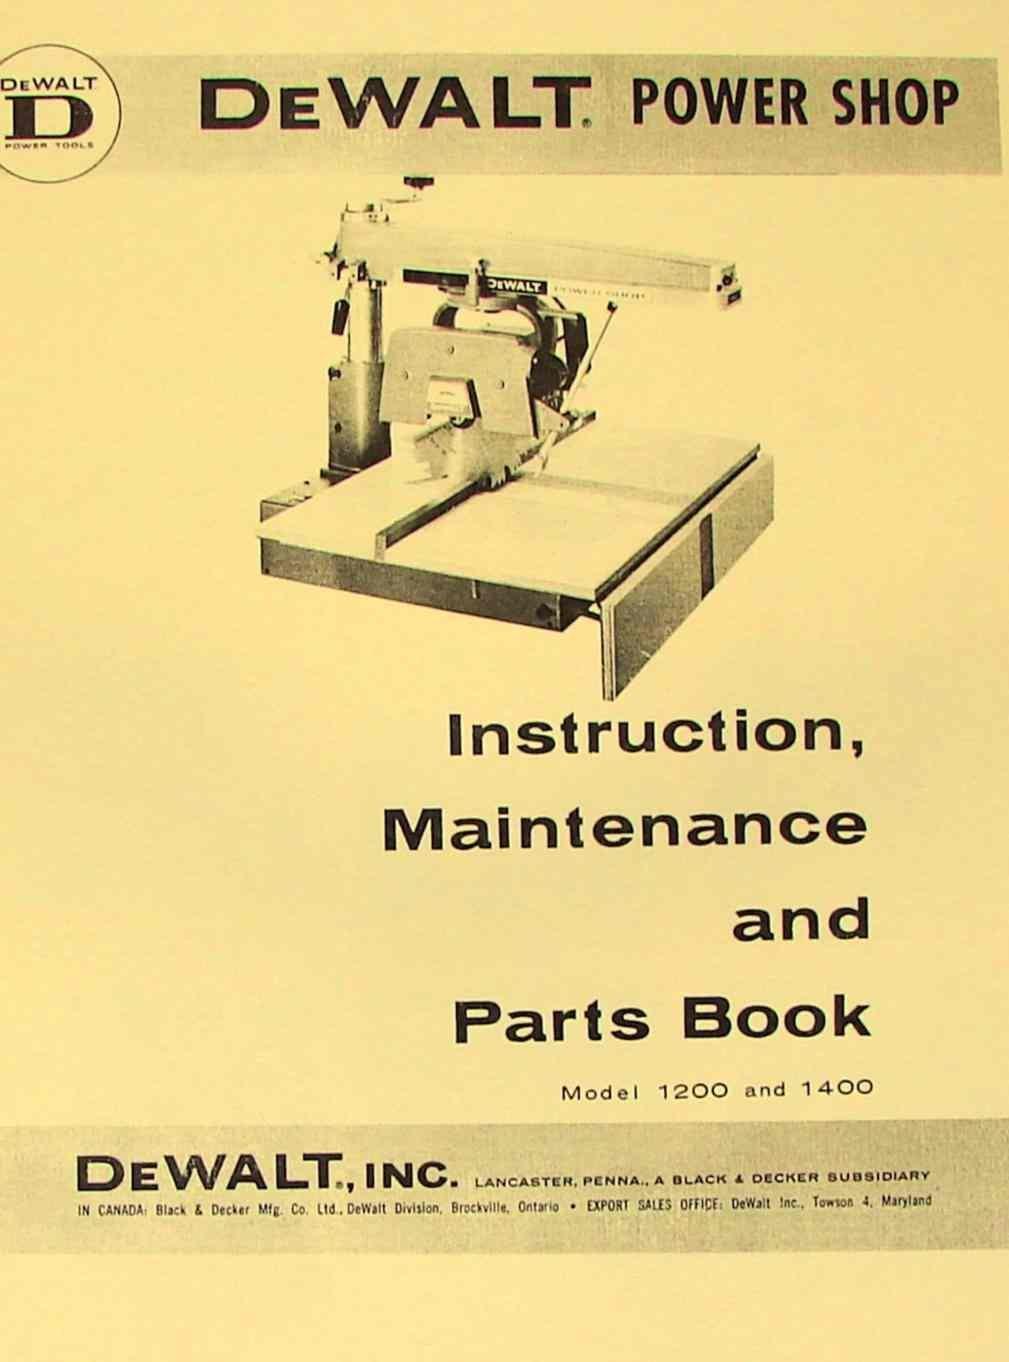 dewalt power shop 1200 & 1400 radial arm saw instructions & parts manual  plastic comb – 1900